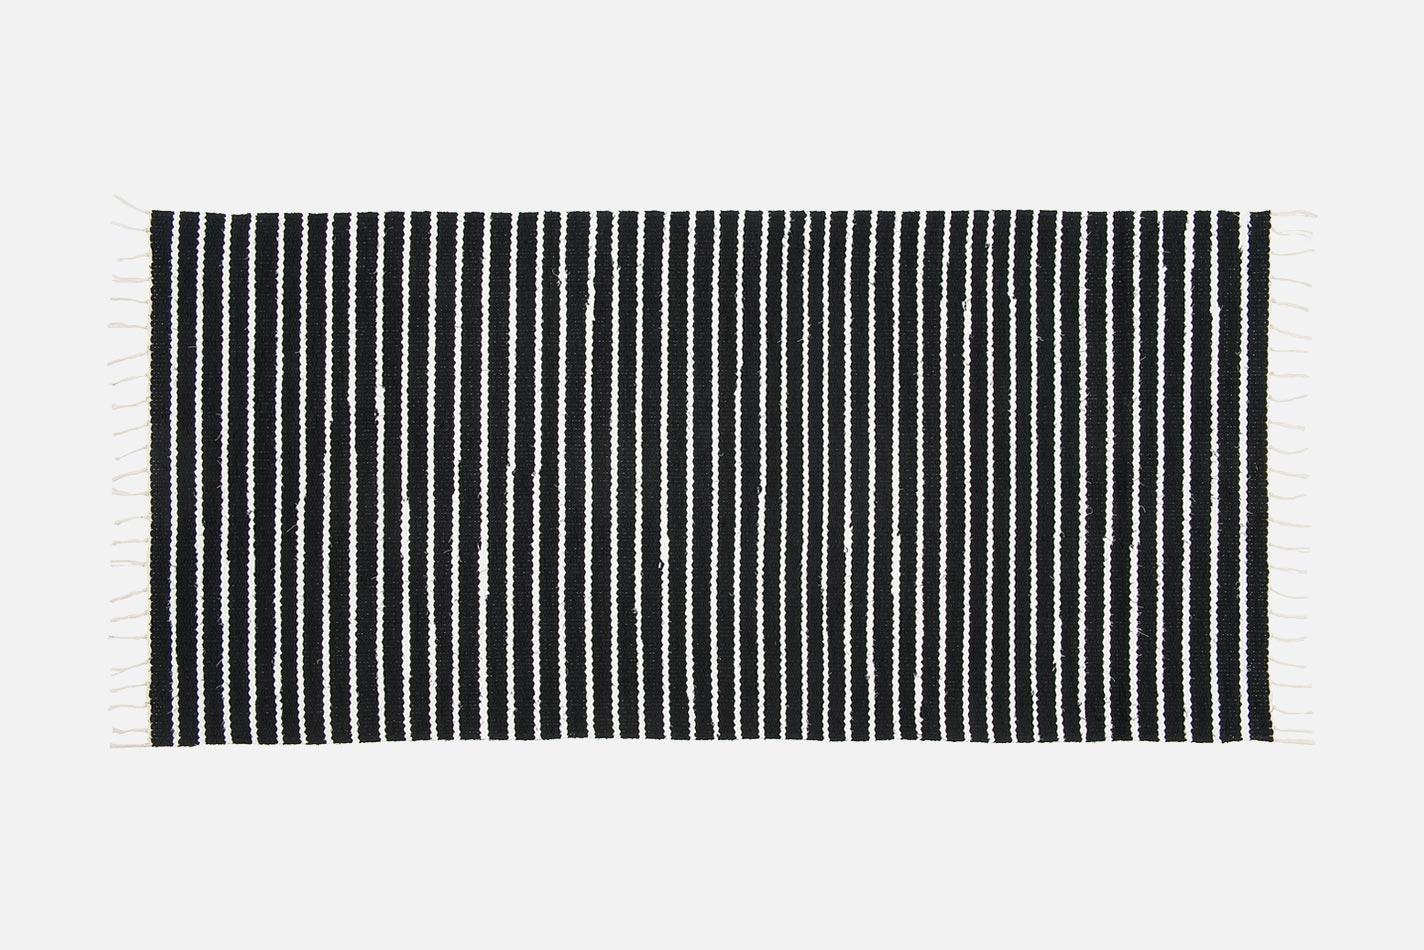 VM Carpet Aitta matto 1 musta-valkoinen, Design Ristomatti Ratia